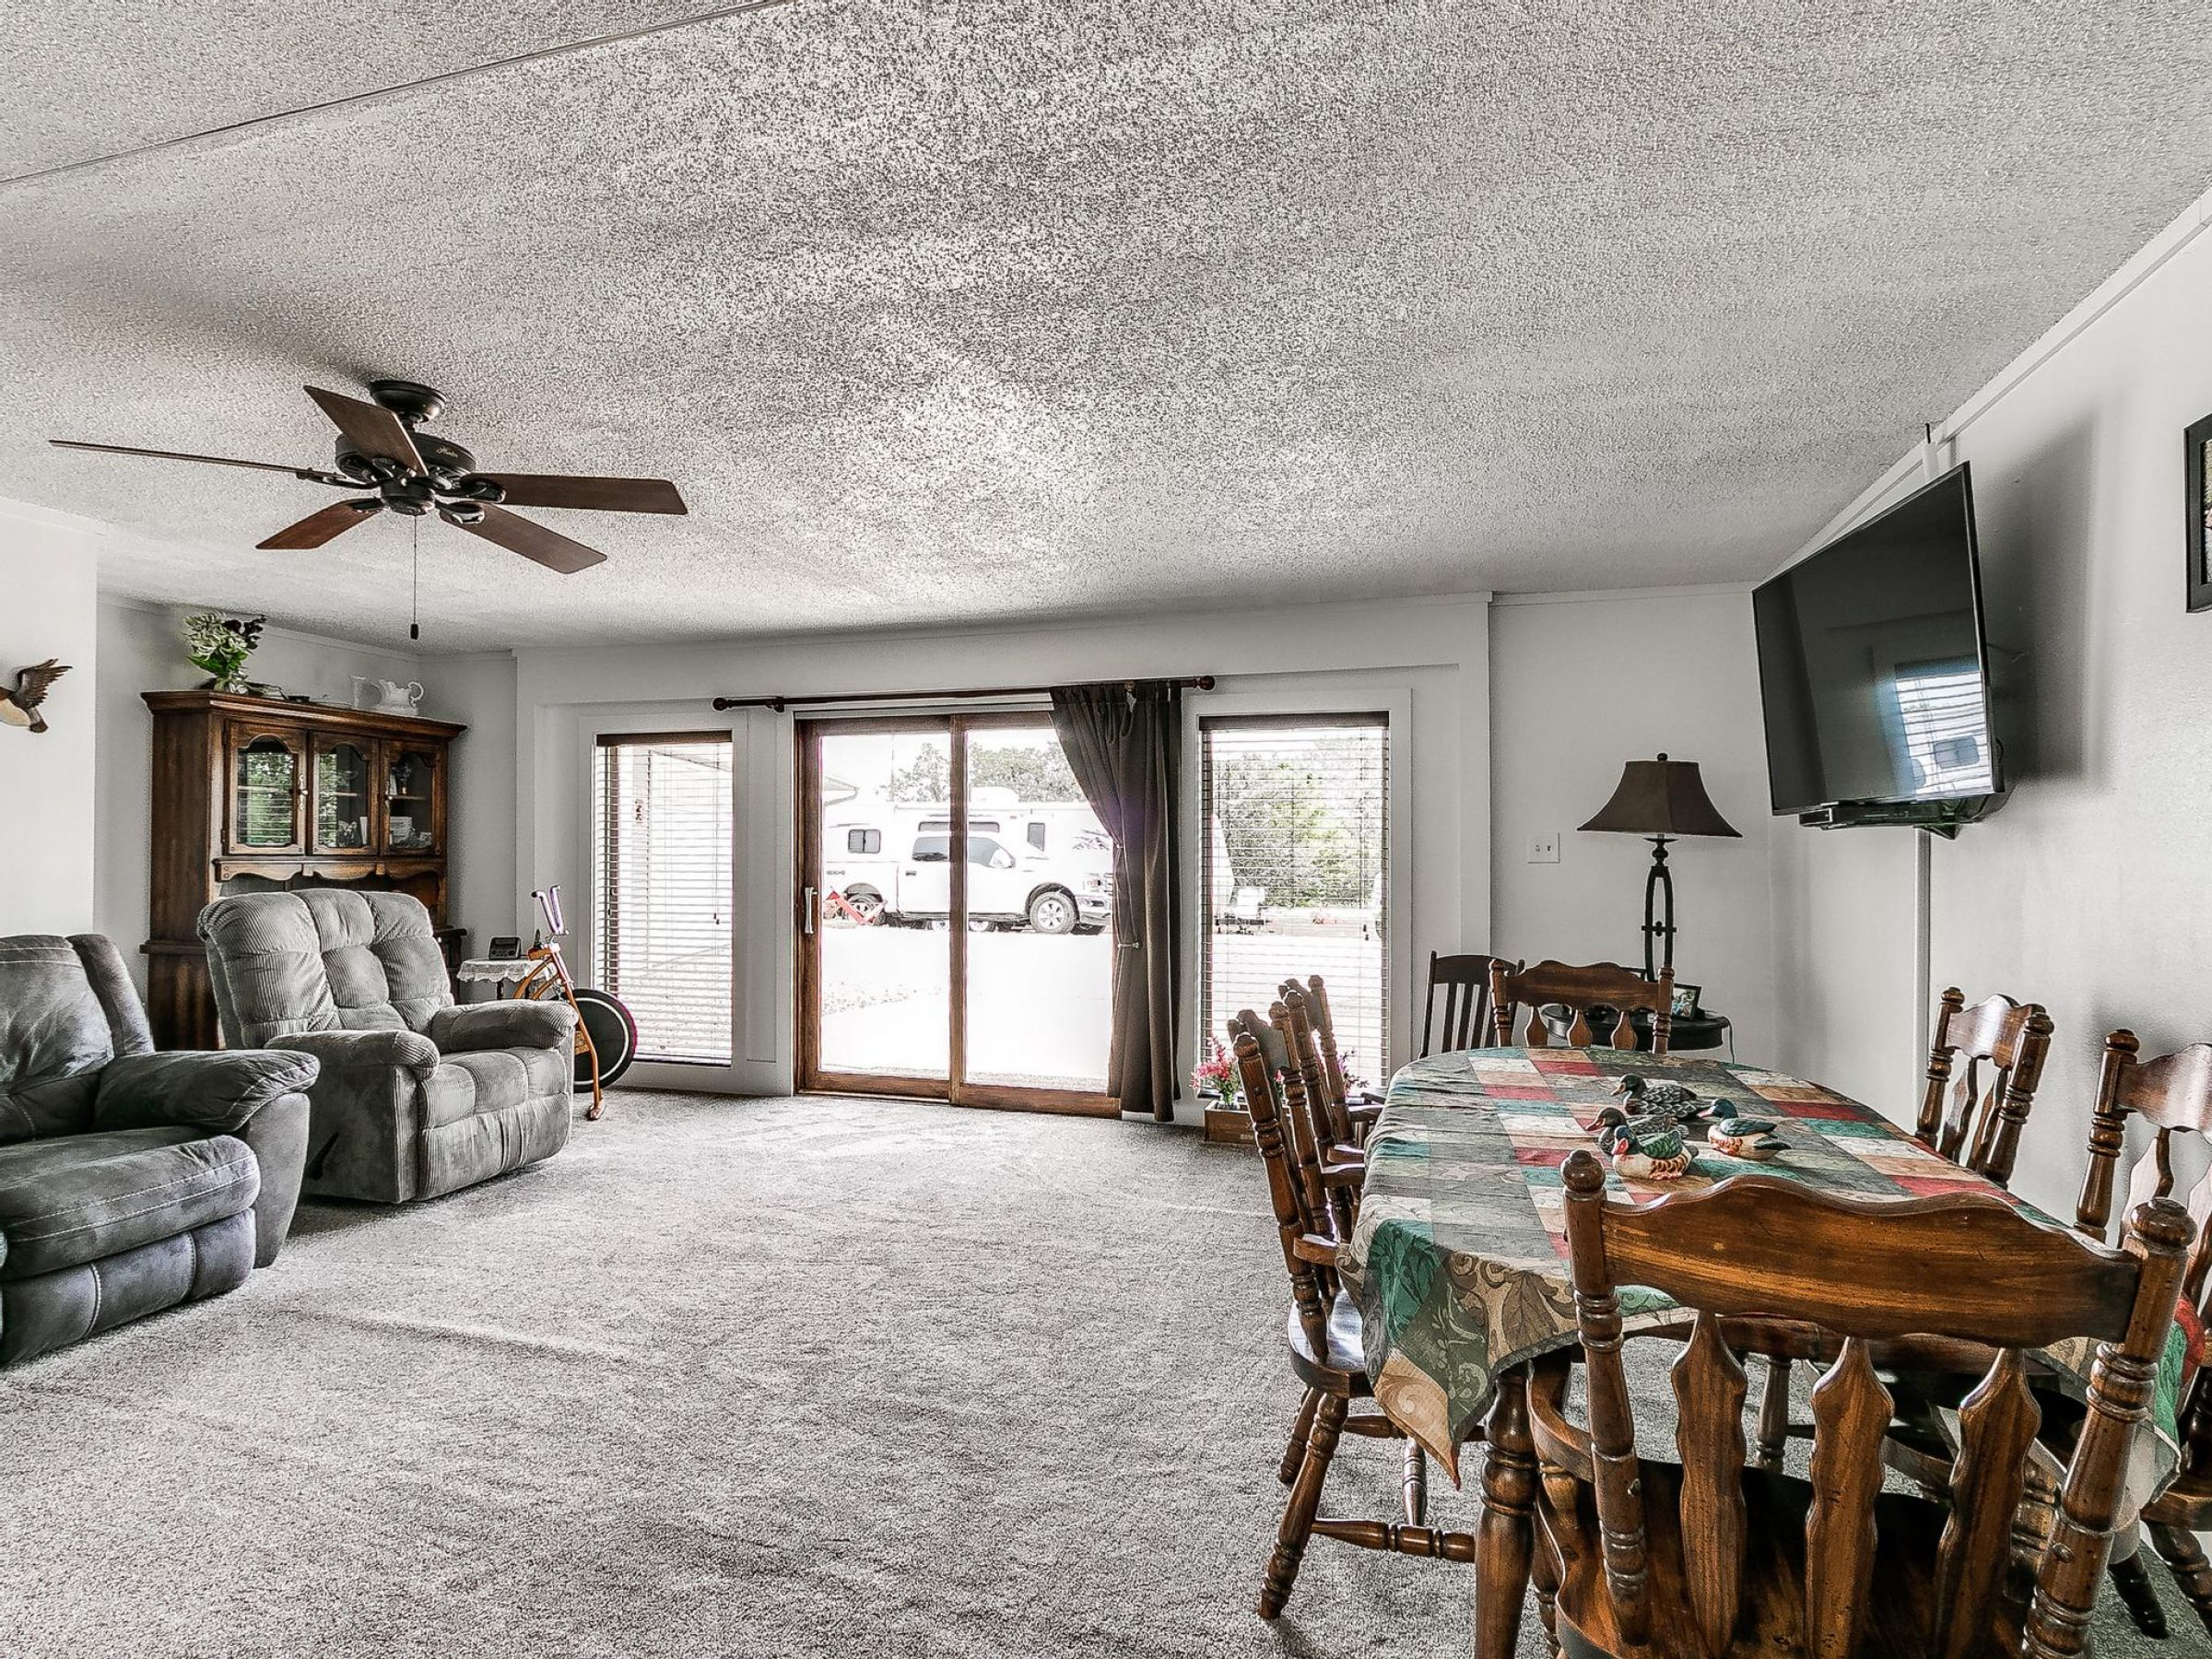 residential-warren-county-iowa-3-acres-listing-number-15593-0-2021-06-18-155138.jpg